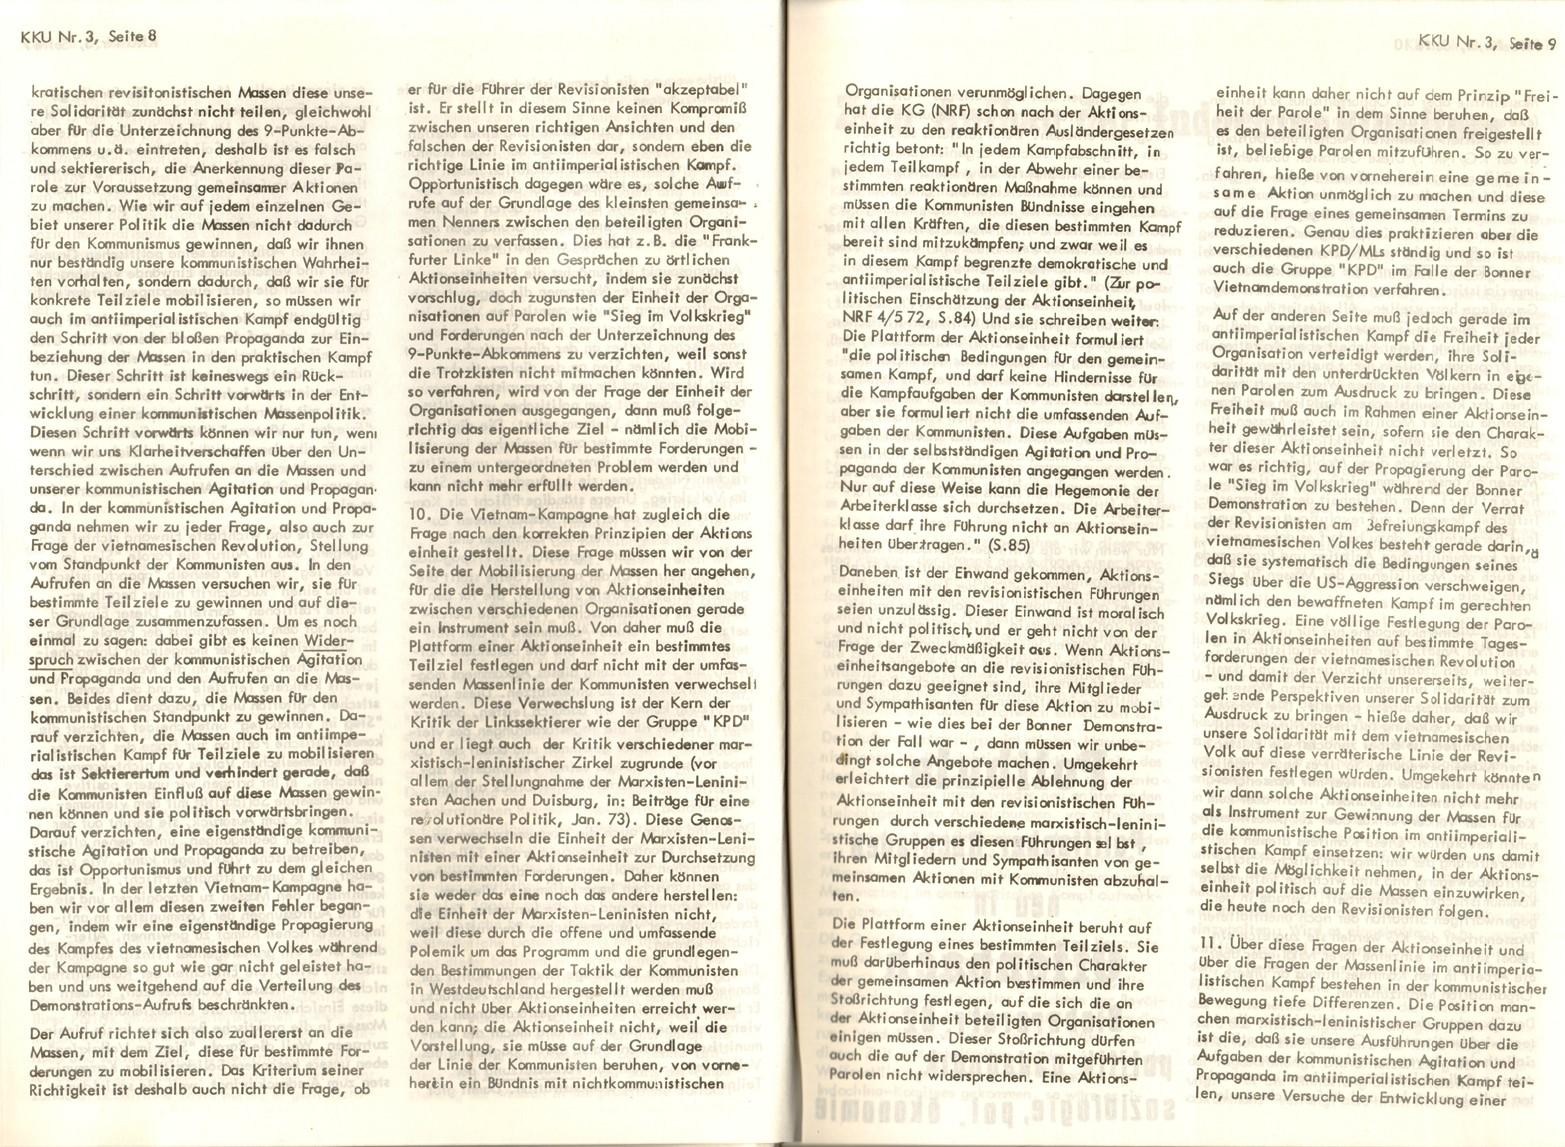 Frankfurt_Offenbach_KG_Kampf_Kritik_Umgestaltung_1973_03_06